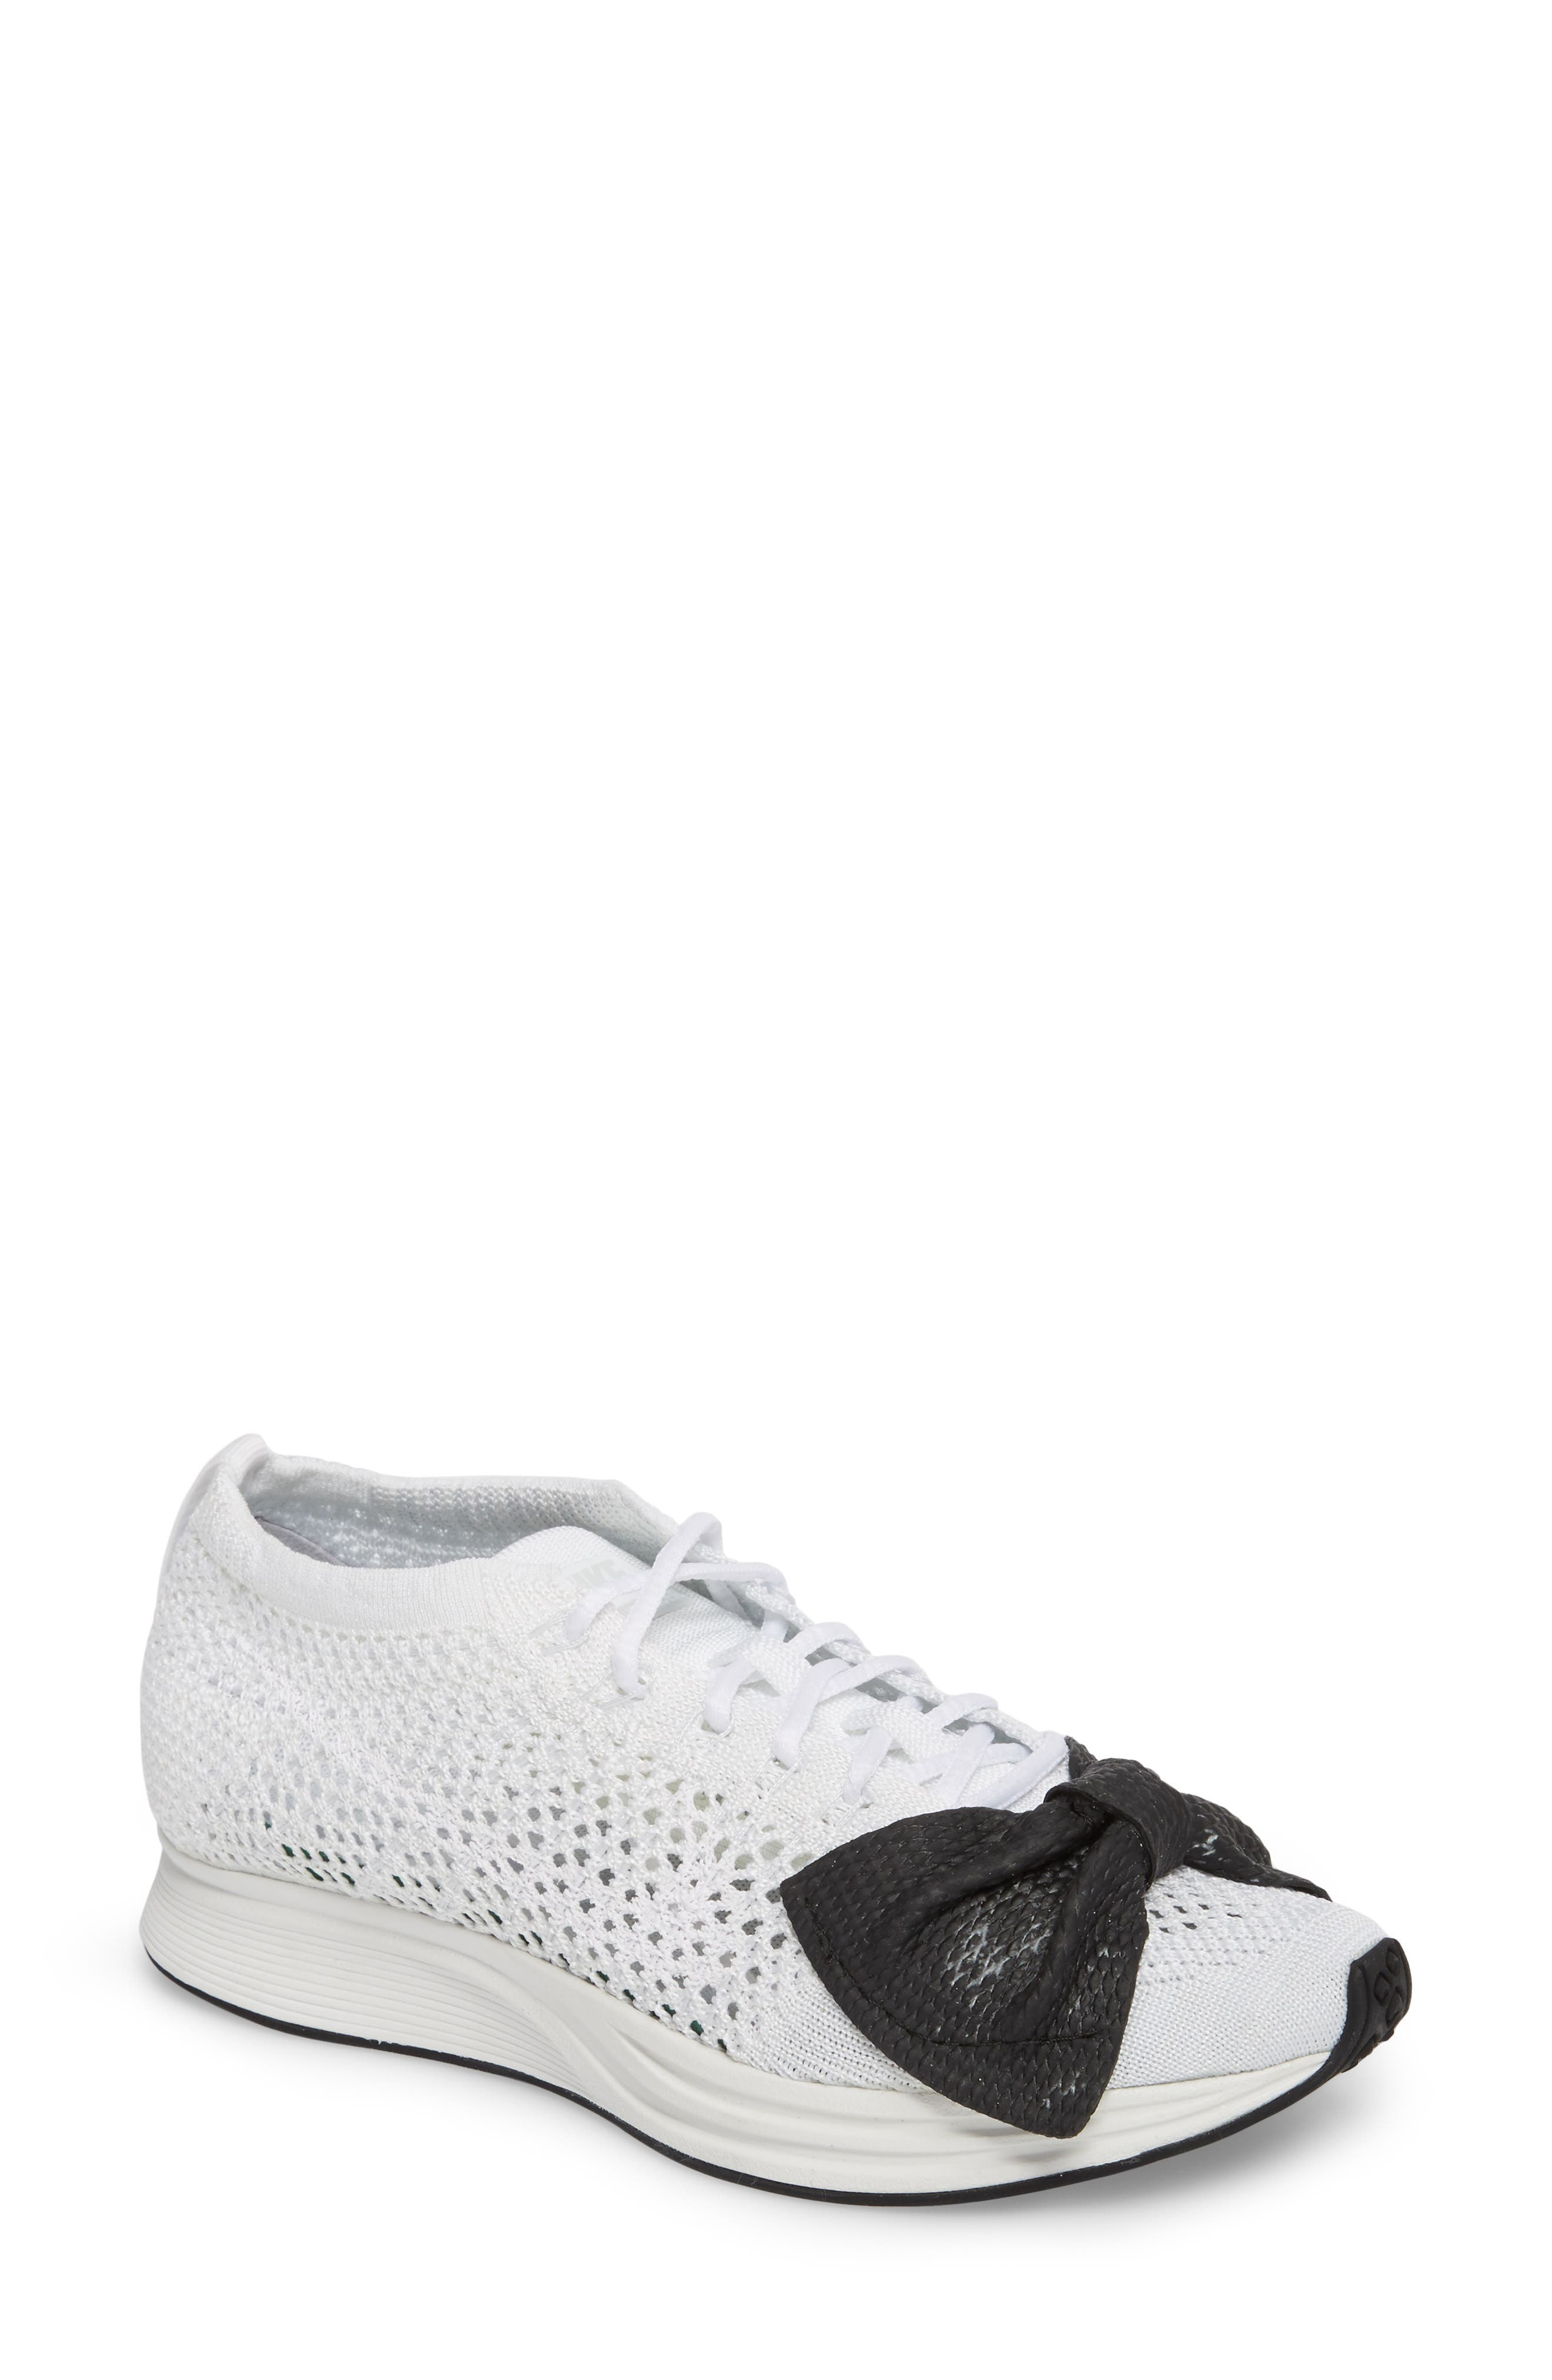 x Nike Bow Flyknit Racer Sneaker,                         Main,                         color, White